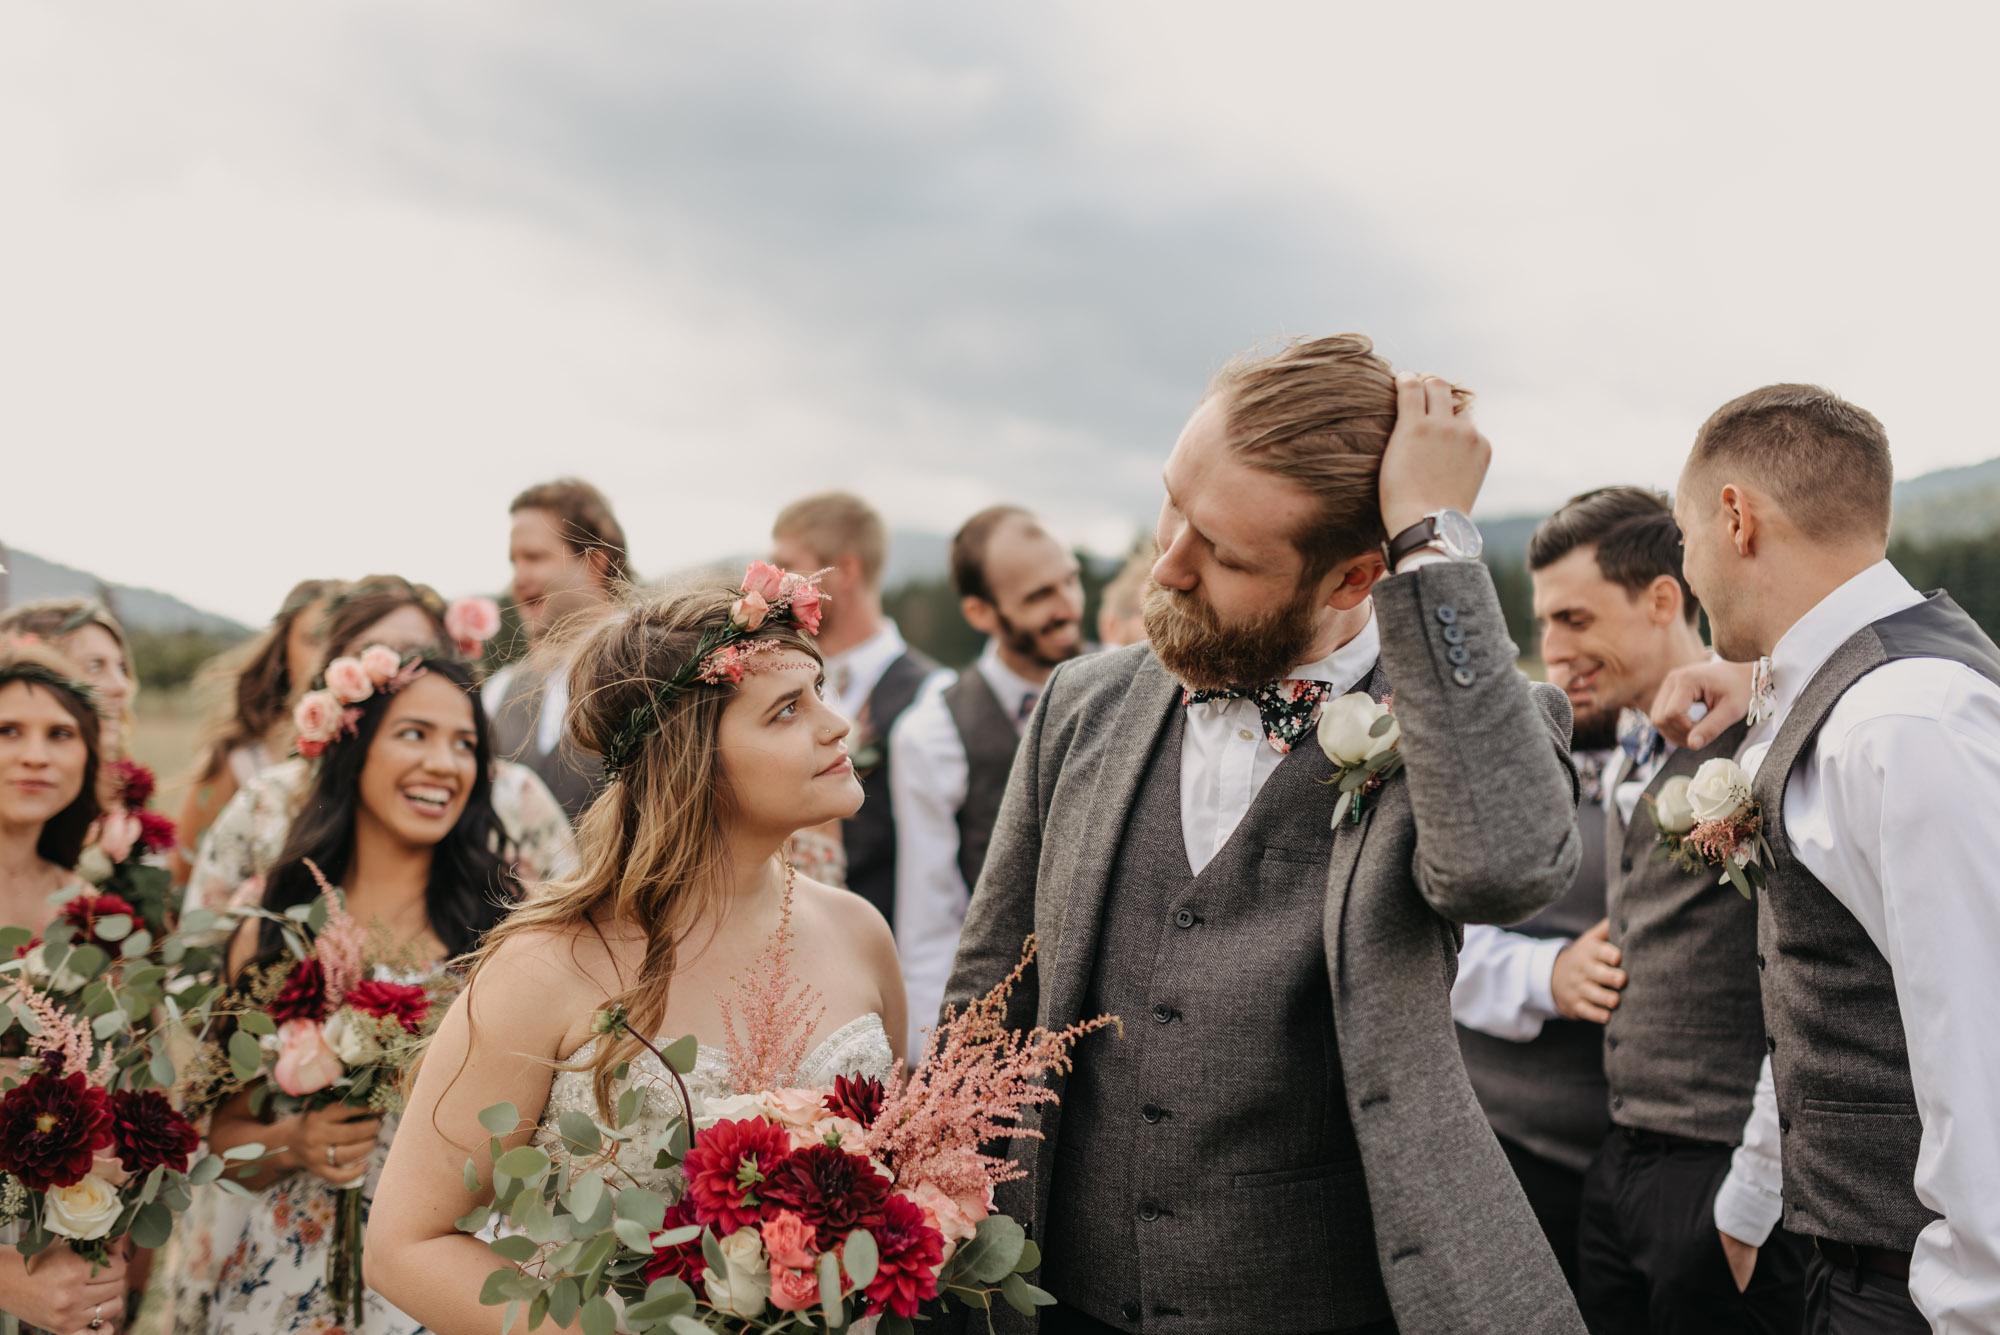 Bridal-Party-Free-People-Flower-Dresses-Washington-Wedding-8663.jpg